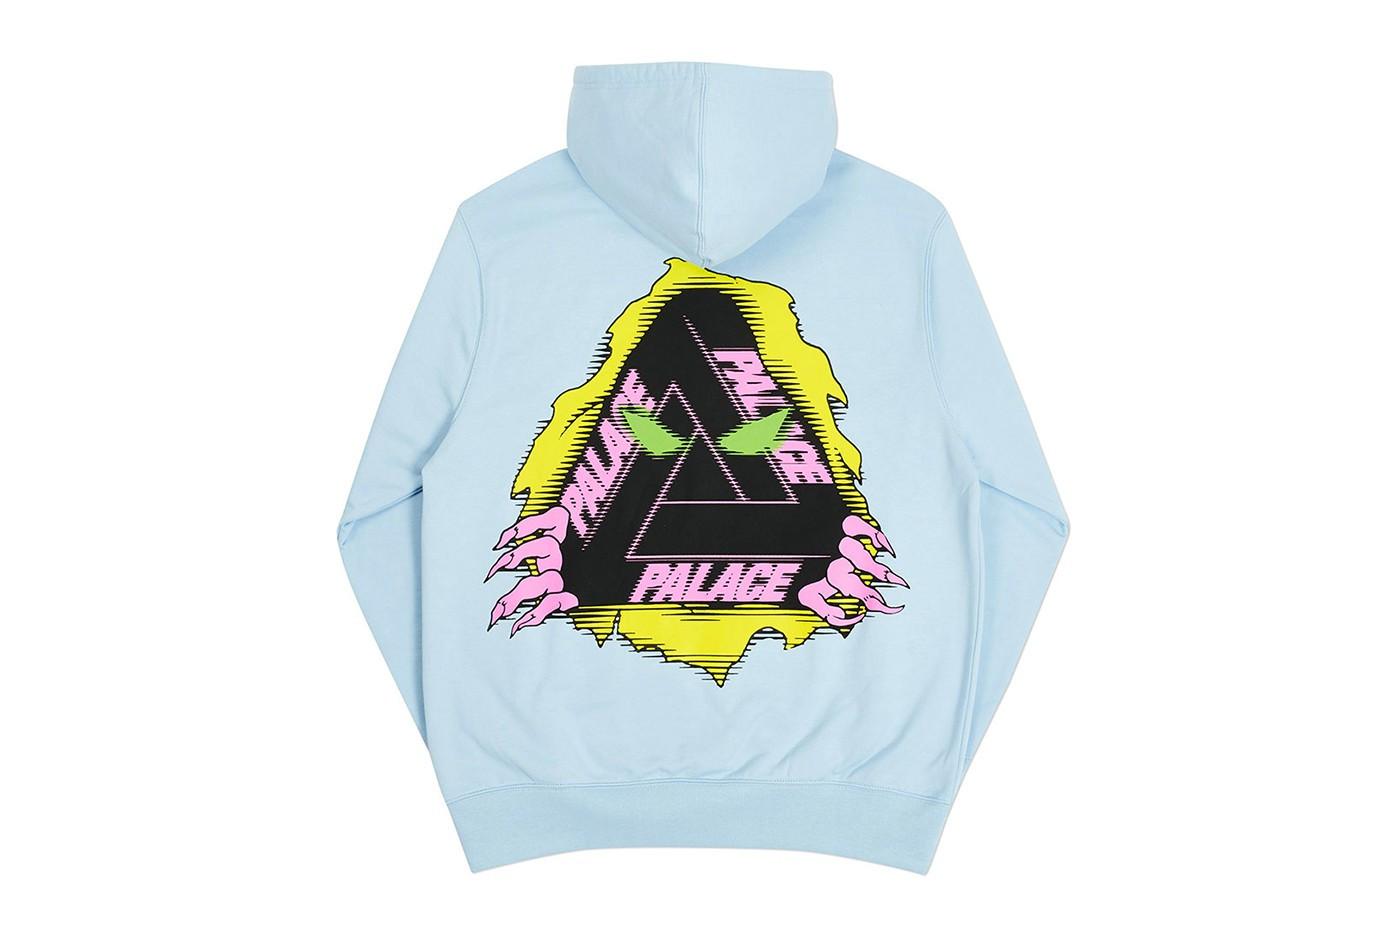 Palace Winter 2020 Tri-Ferg hoodie